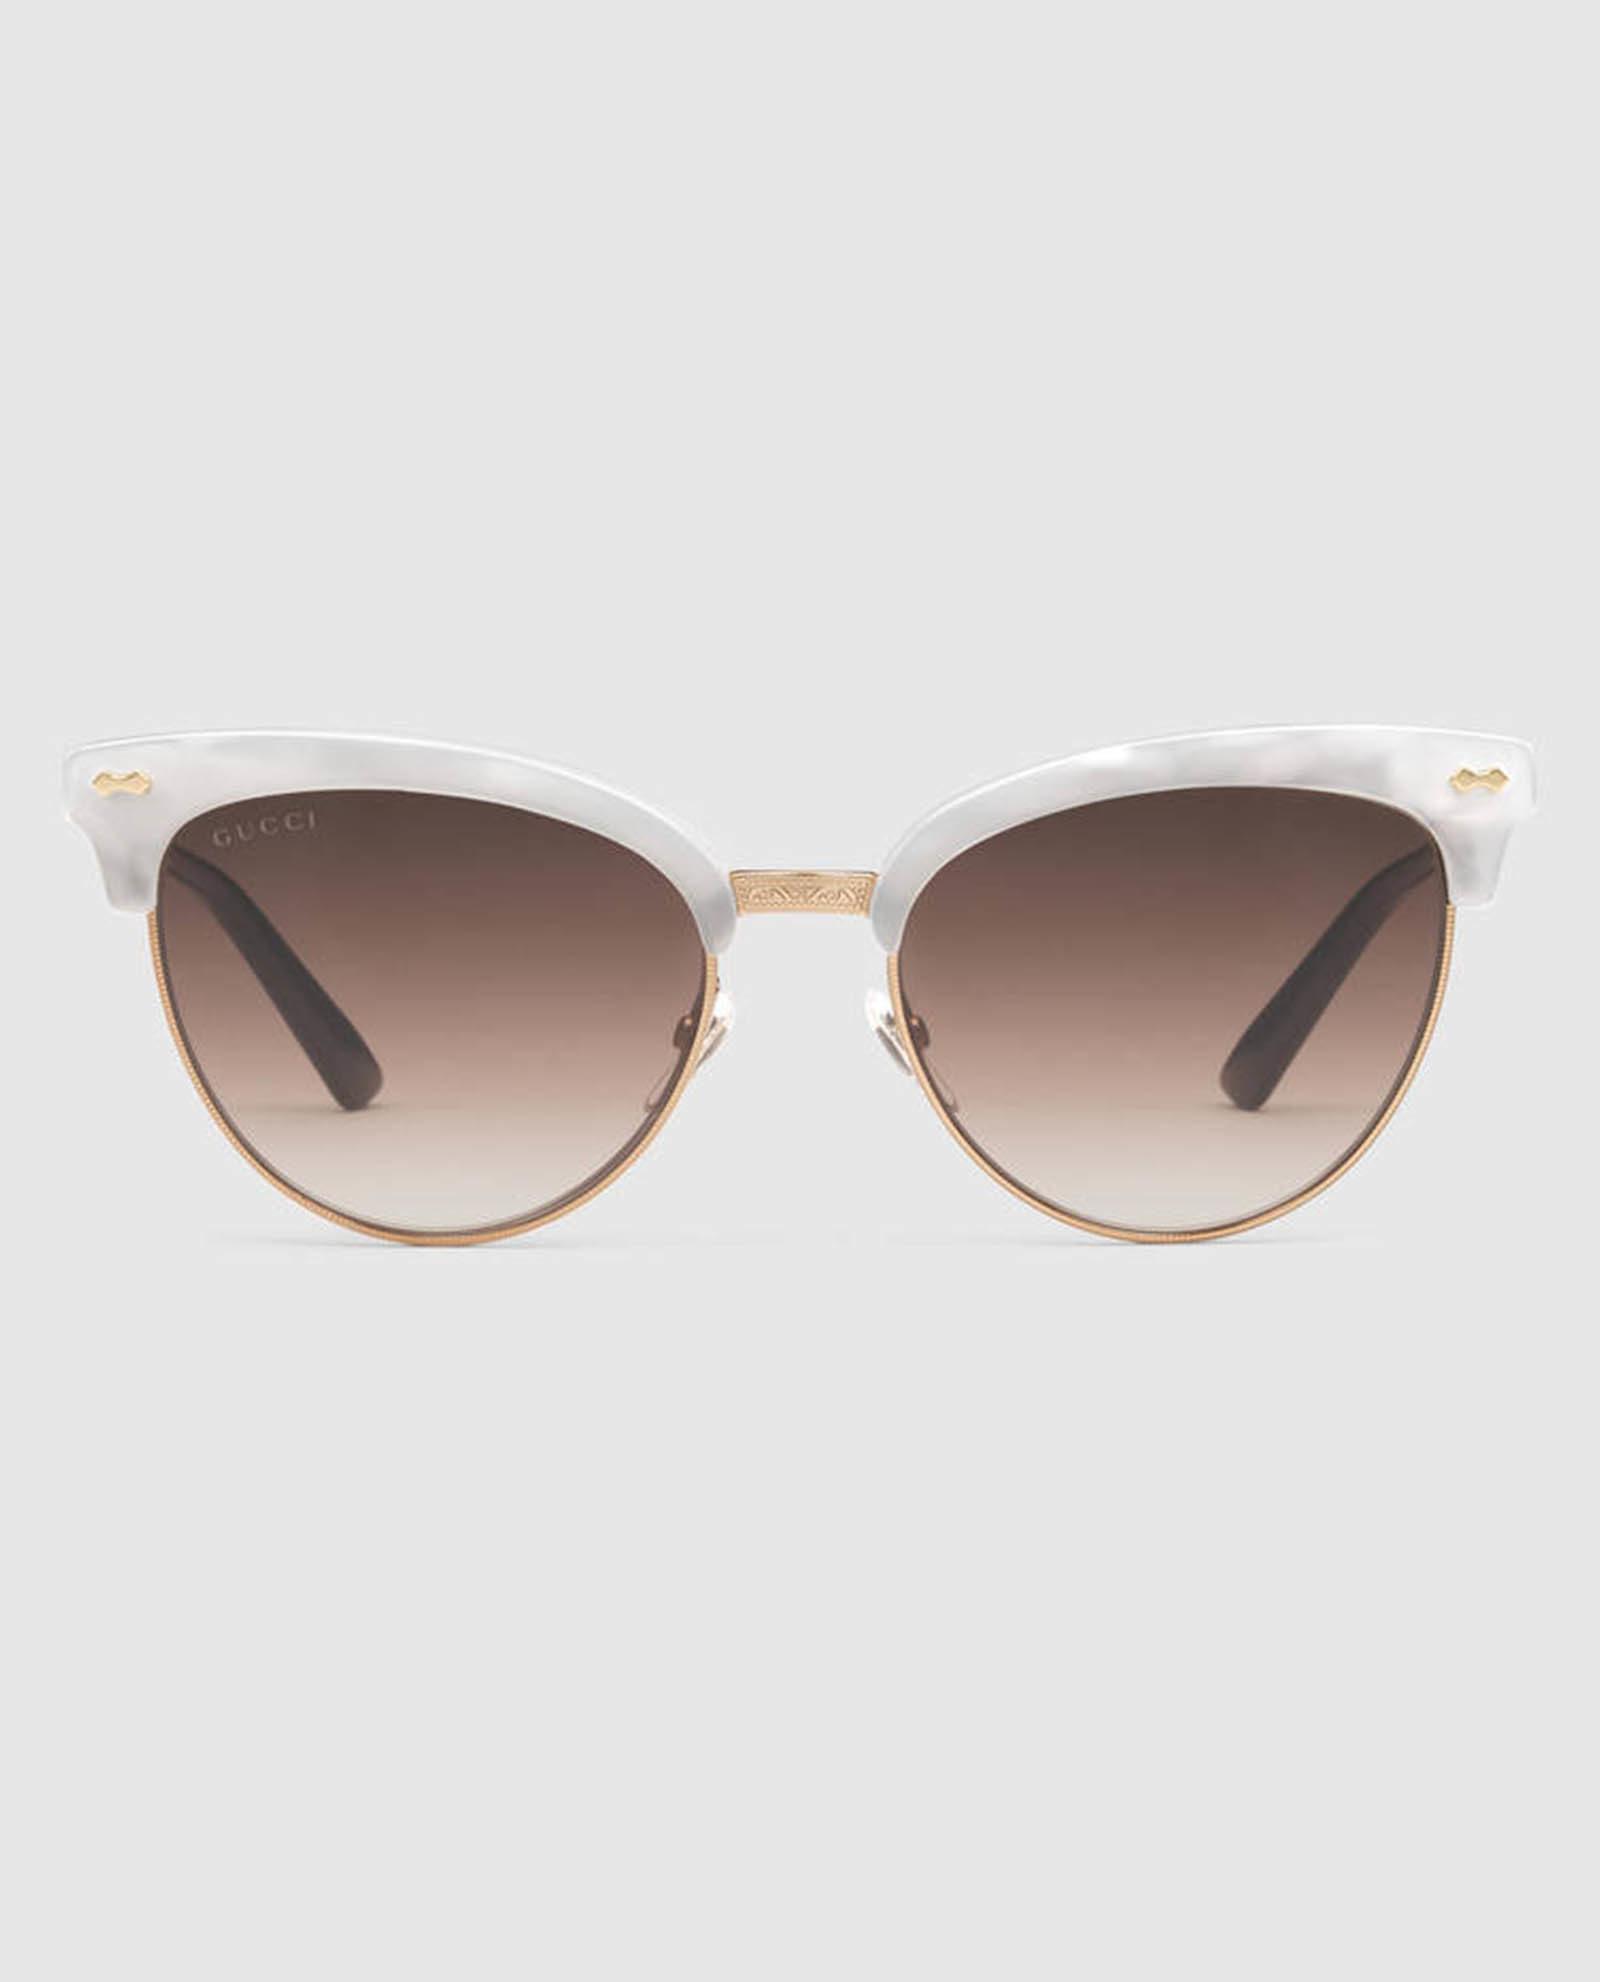 434072_I3330_9825_001_100_0000_Light-Cat-eye-acetate-and-metal-sunglasses-GUCCI-WOMAN